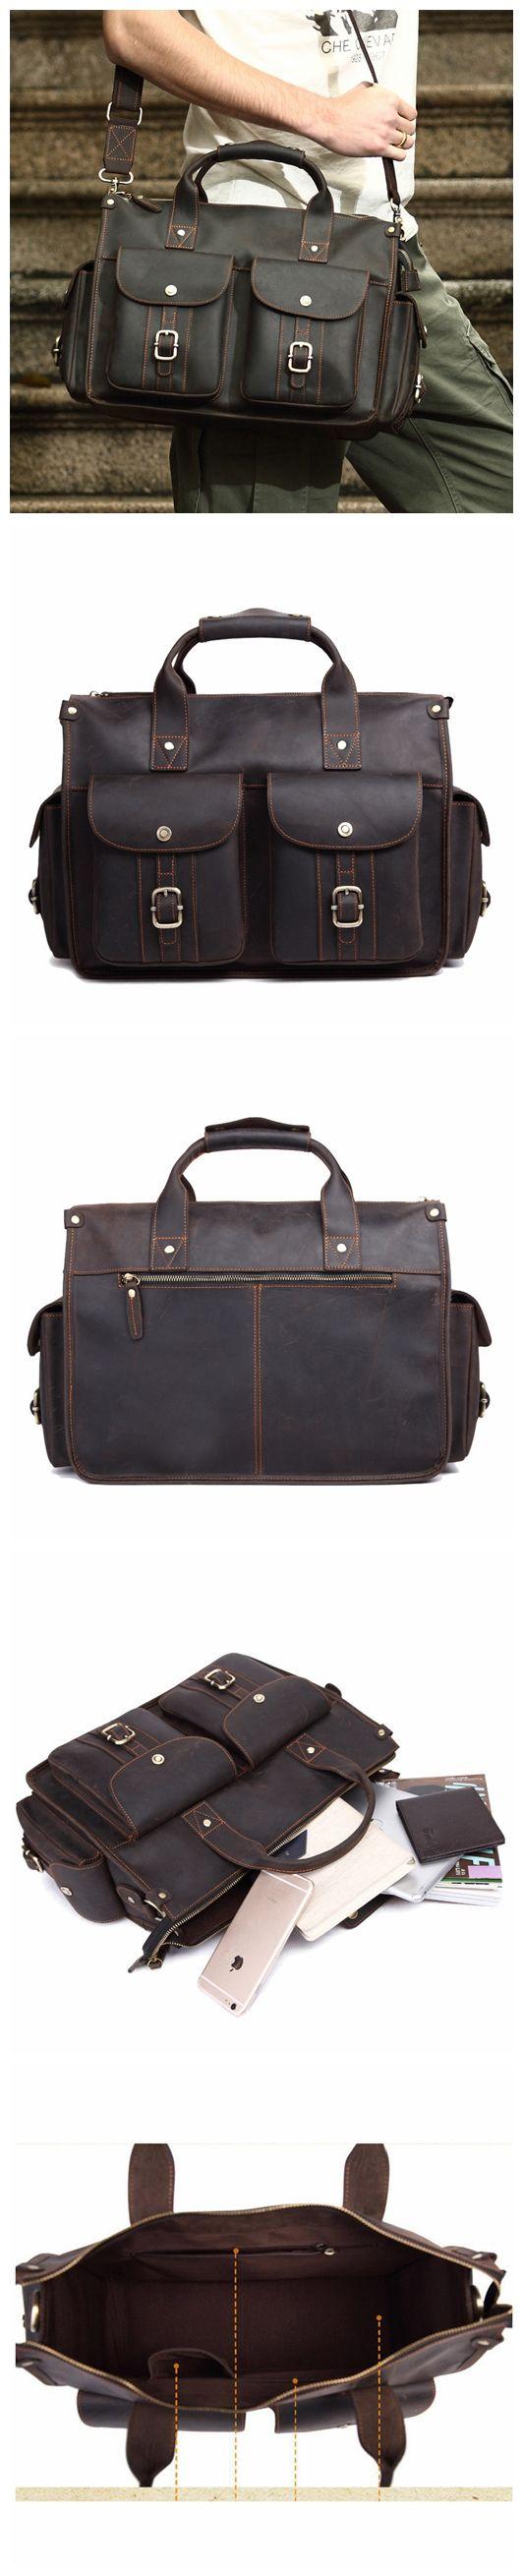 ROCKCOW Handcrafted Rustic Leather Briefcase, Messenger Bag, Laptop Bag, Men's Handbag 8649